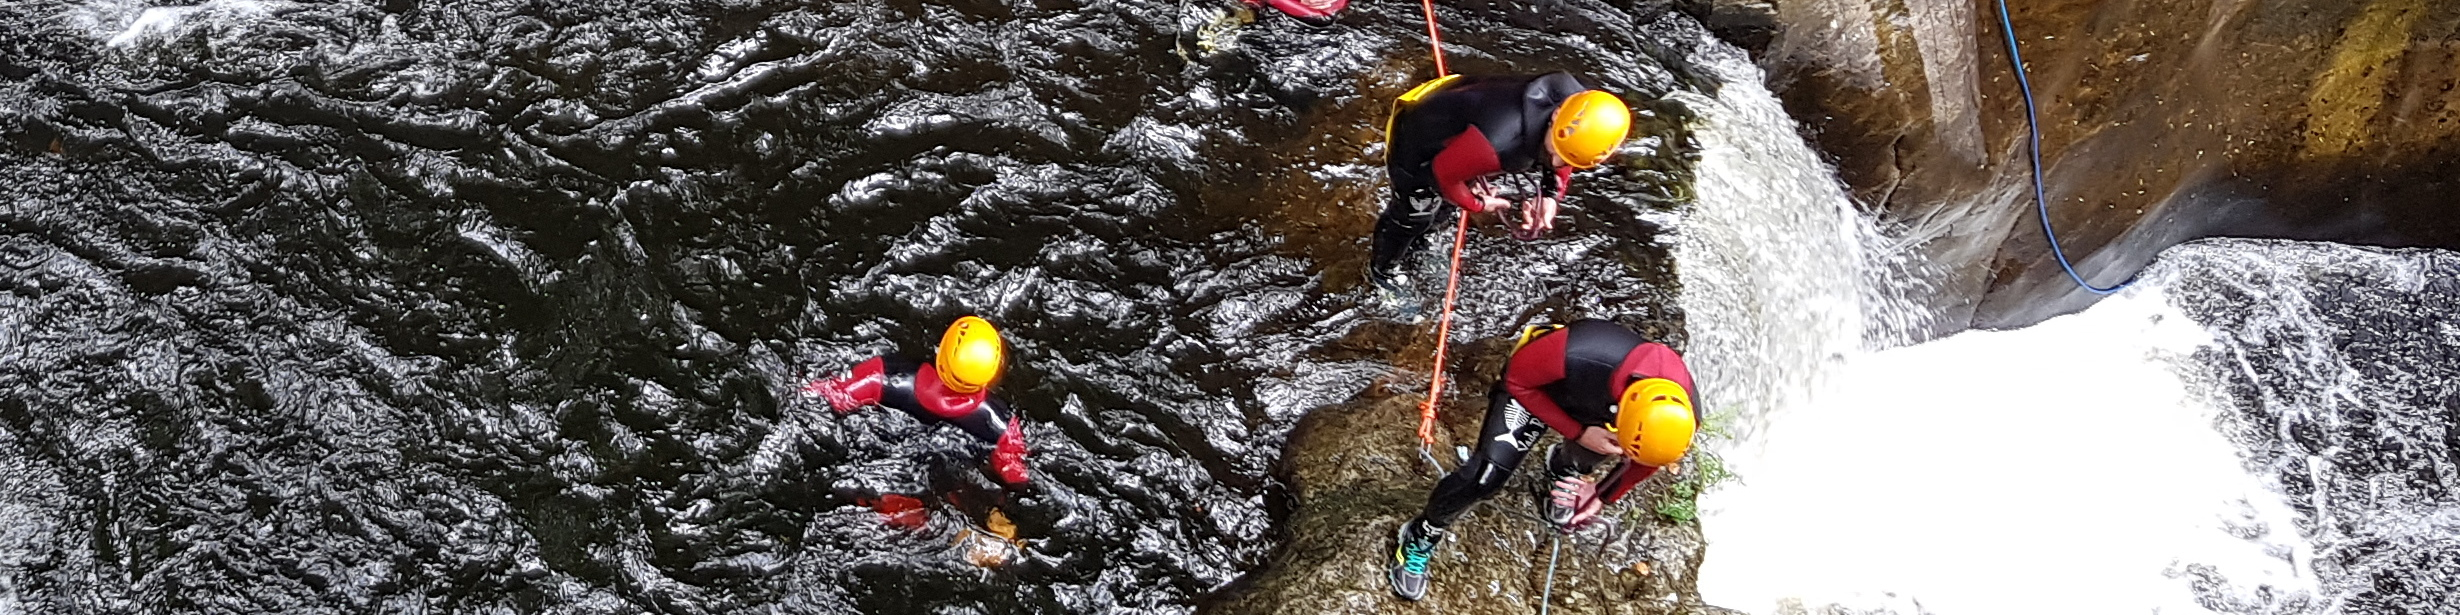 Canyoning en Auvergne